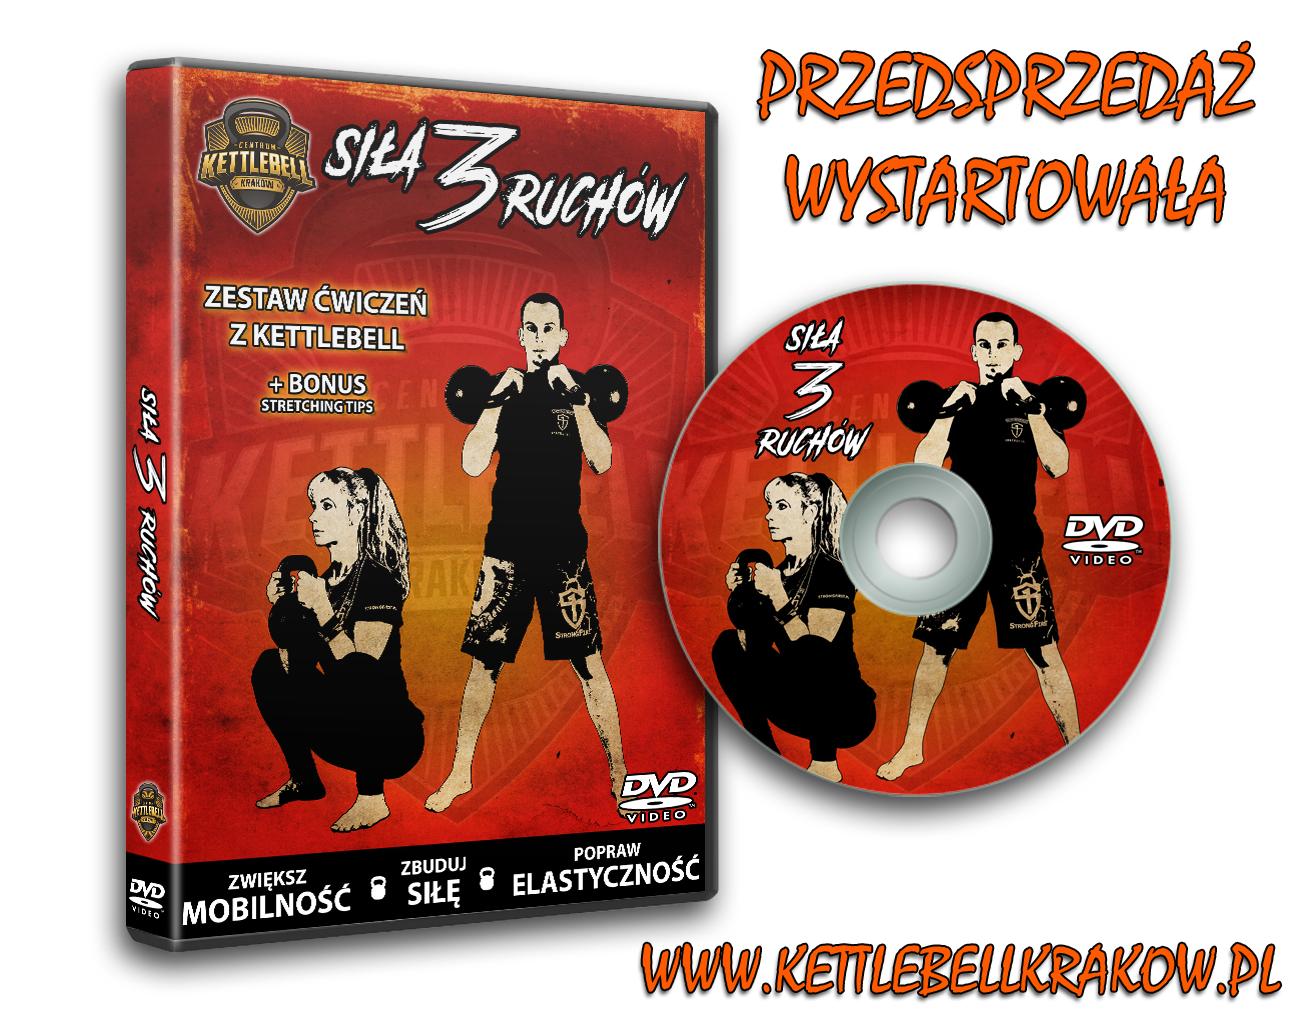 DVD Siła 3 Ruchów